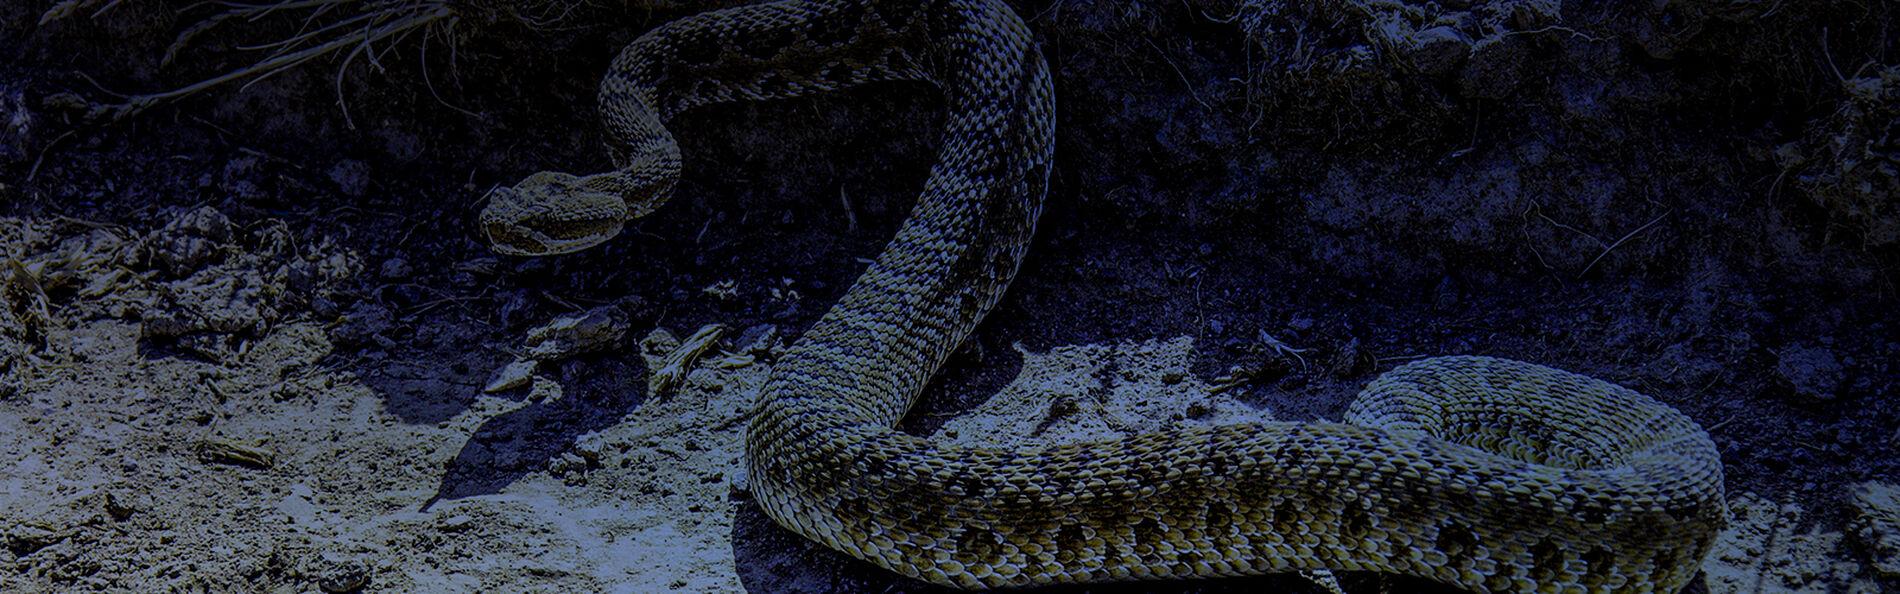 rattlesnake with blue overlay